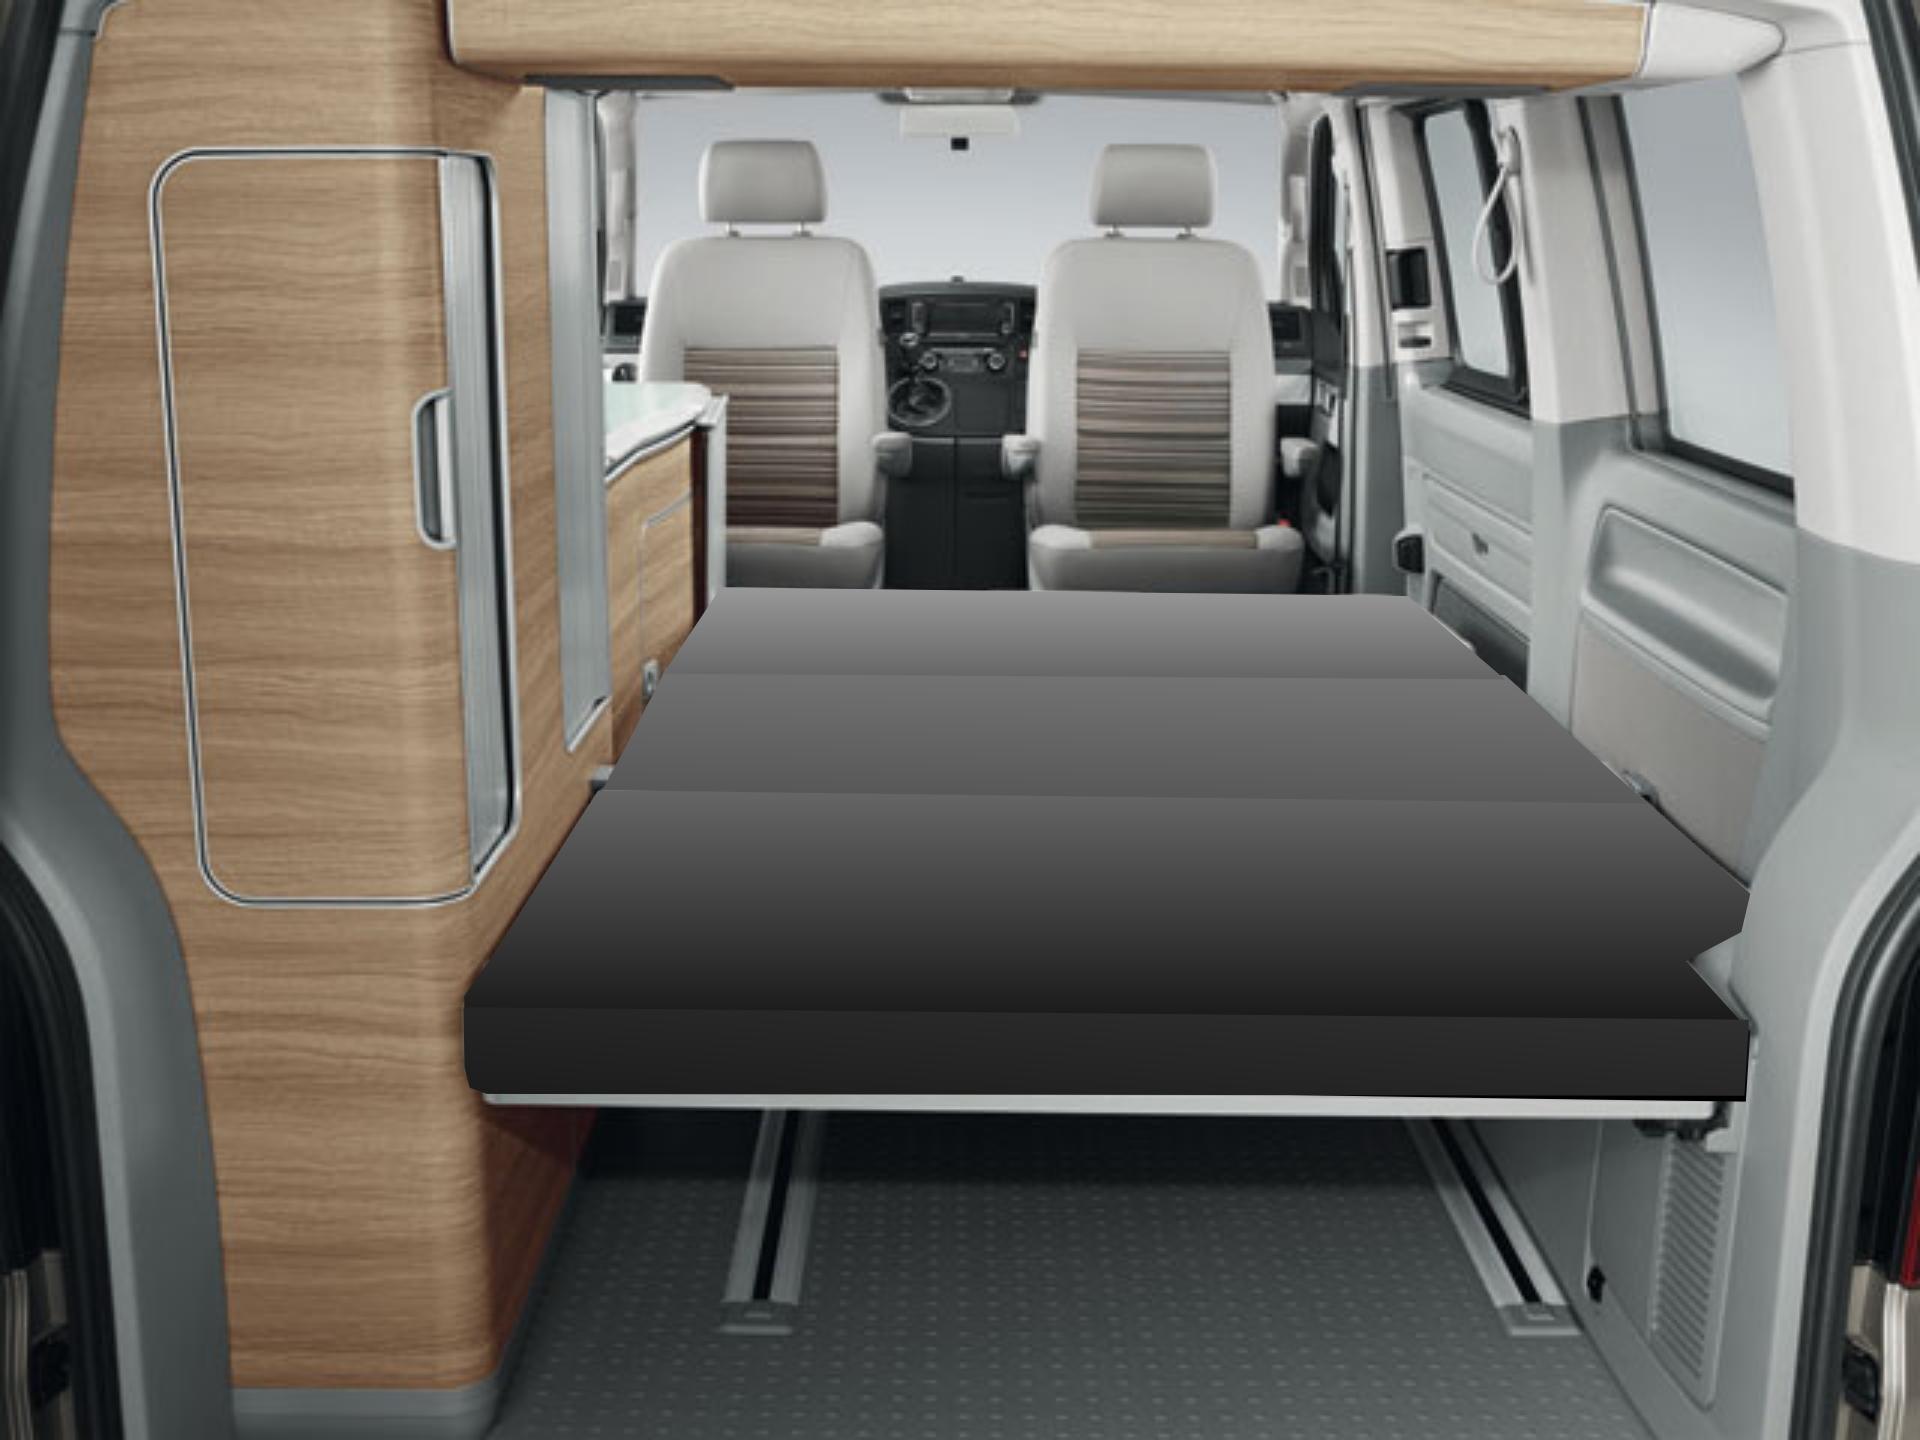 matratze vw t4 t5 t6 schlafauflage bett klappmatratze california 200 x 115 x 8 c. Black Bedroom Furniture Sets. Home Design Ideas